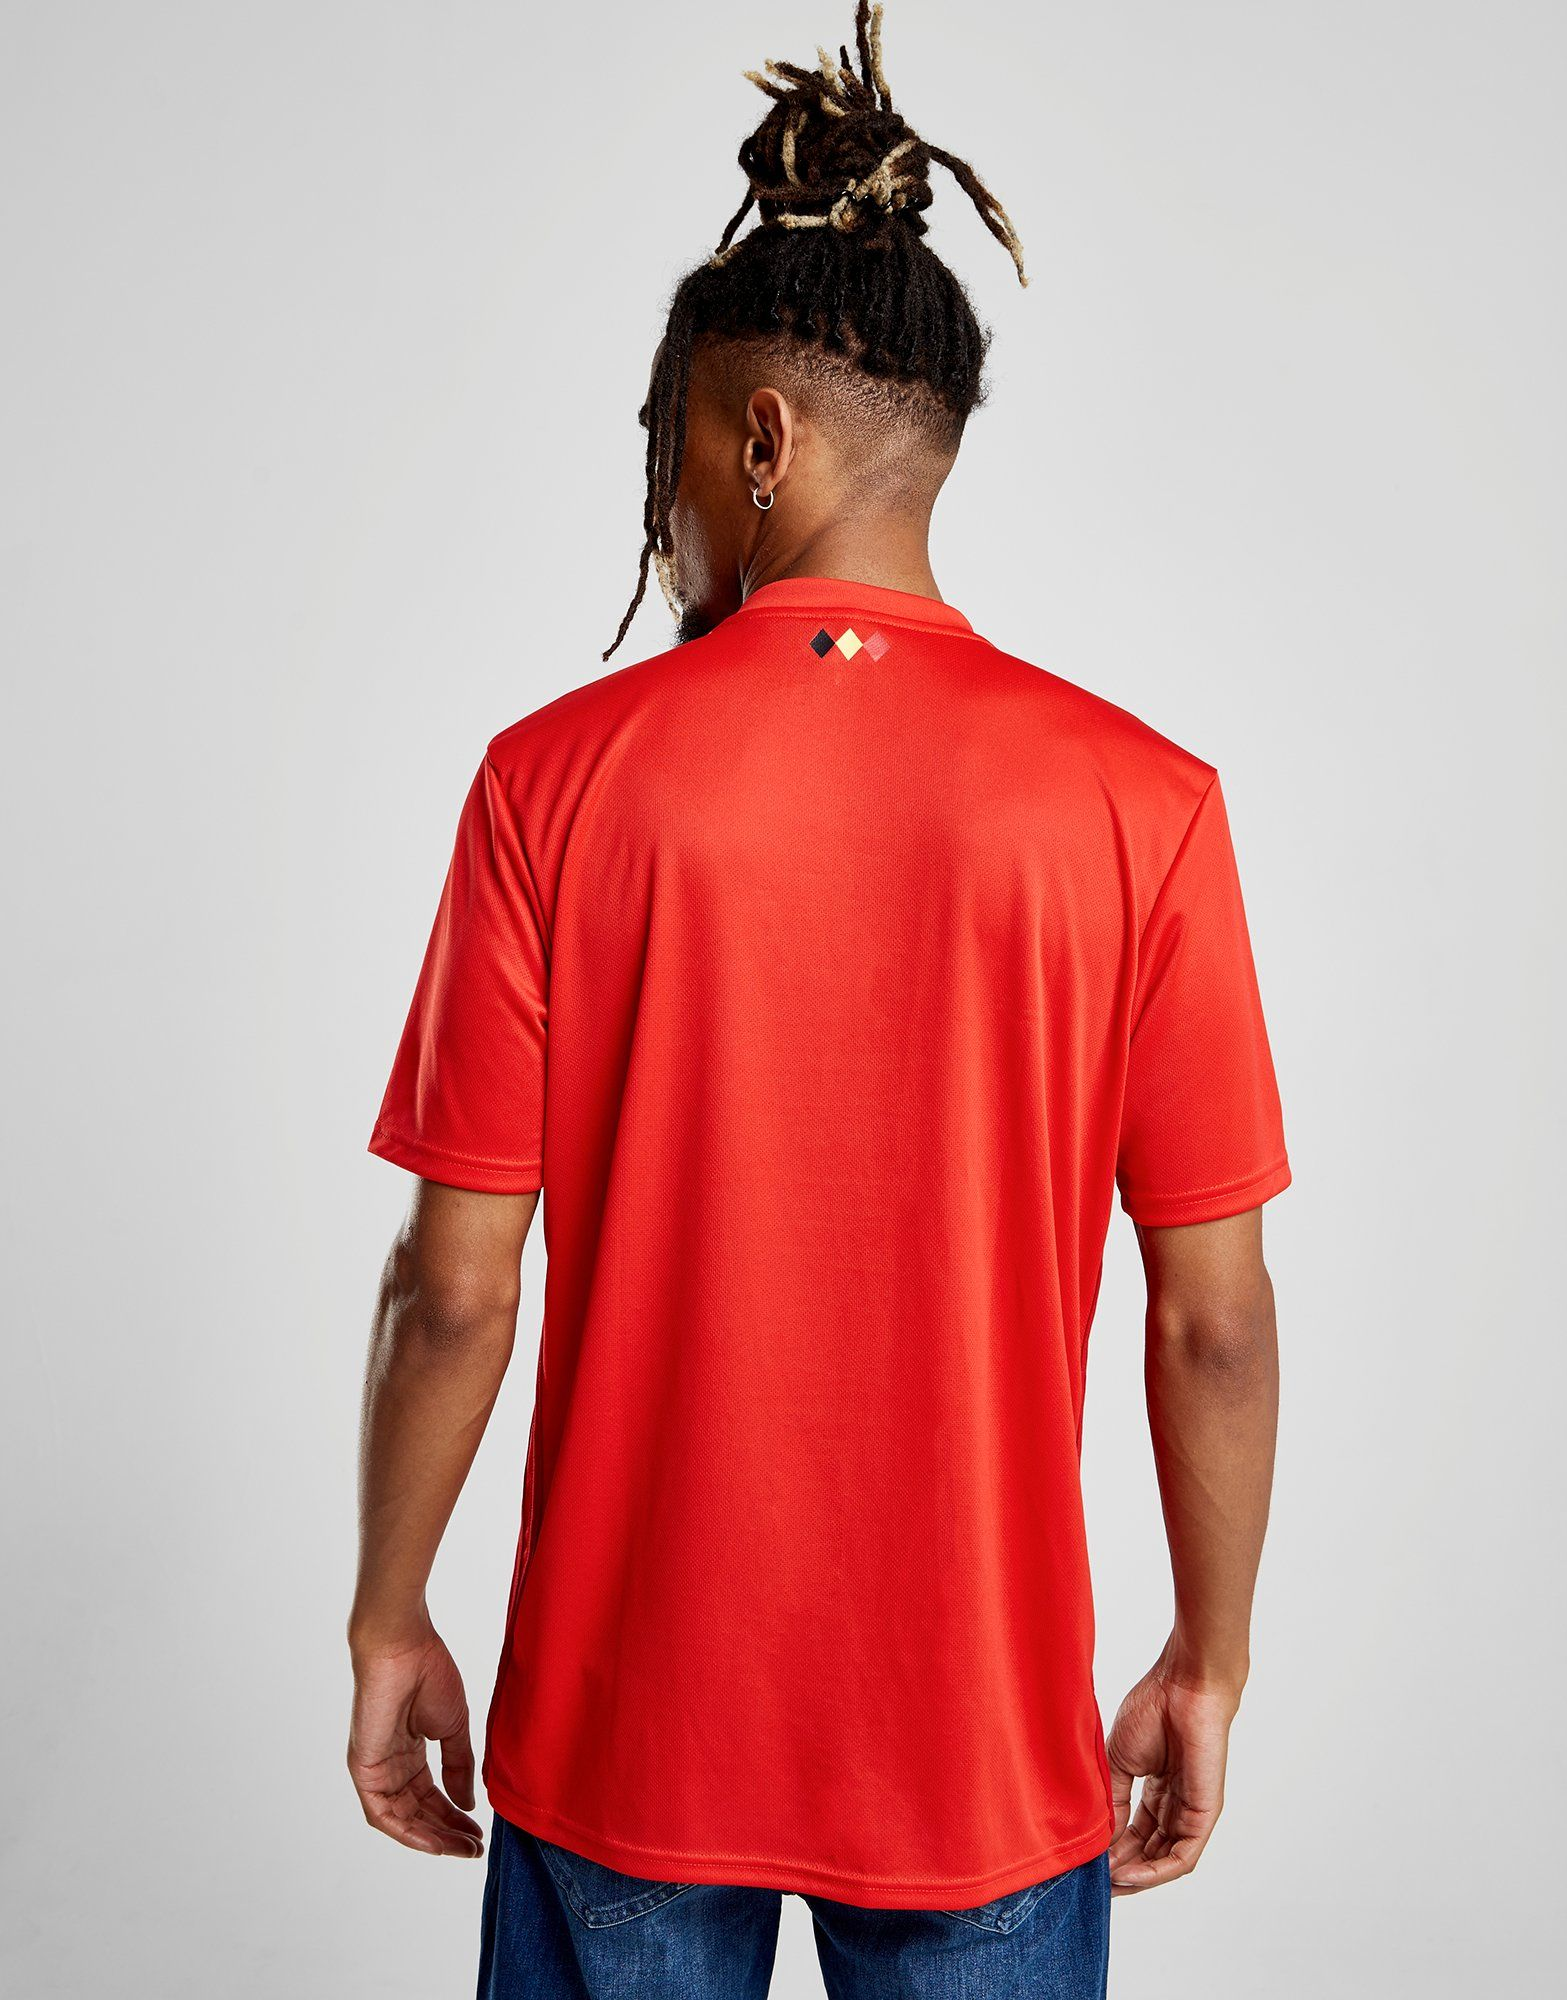 adidas Belgium 2018 Home Shirt